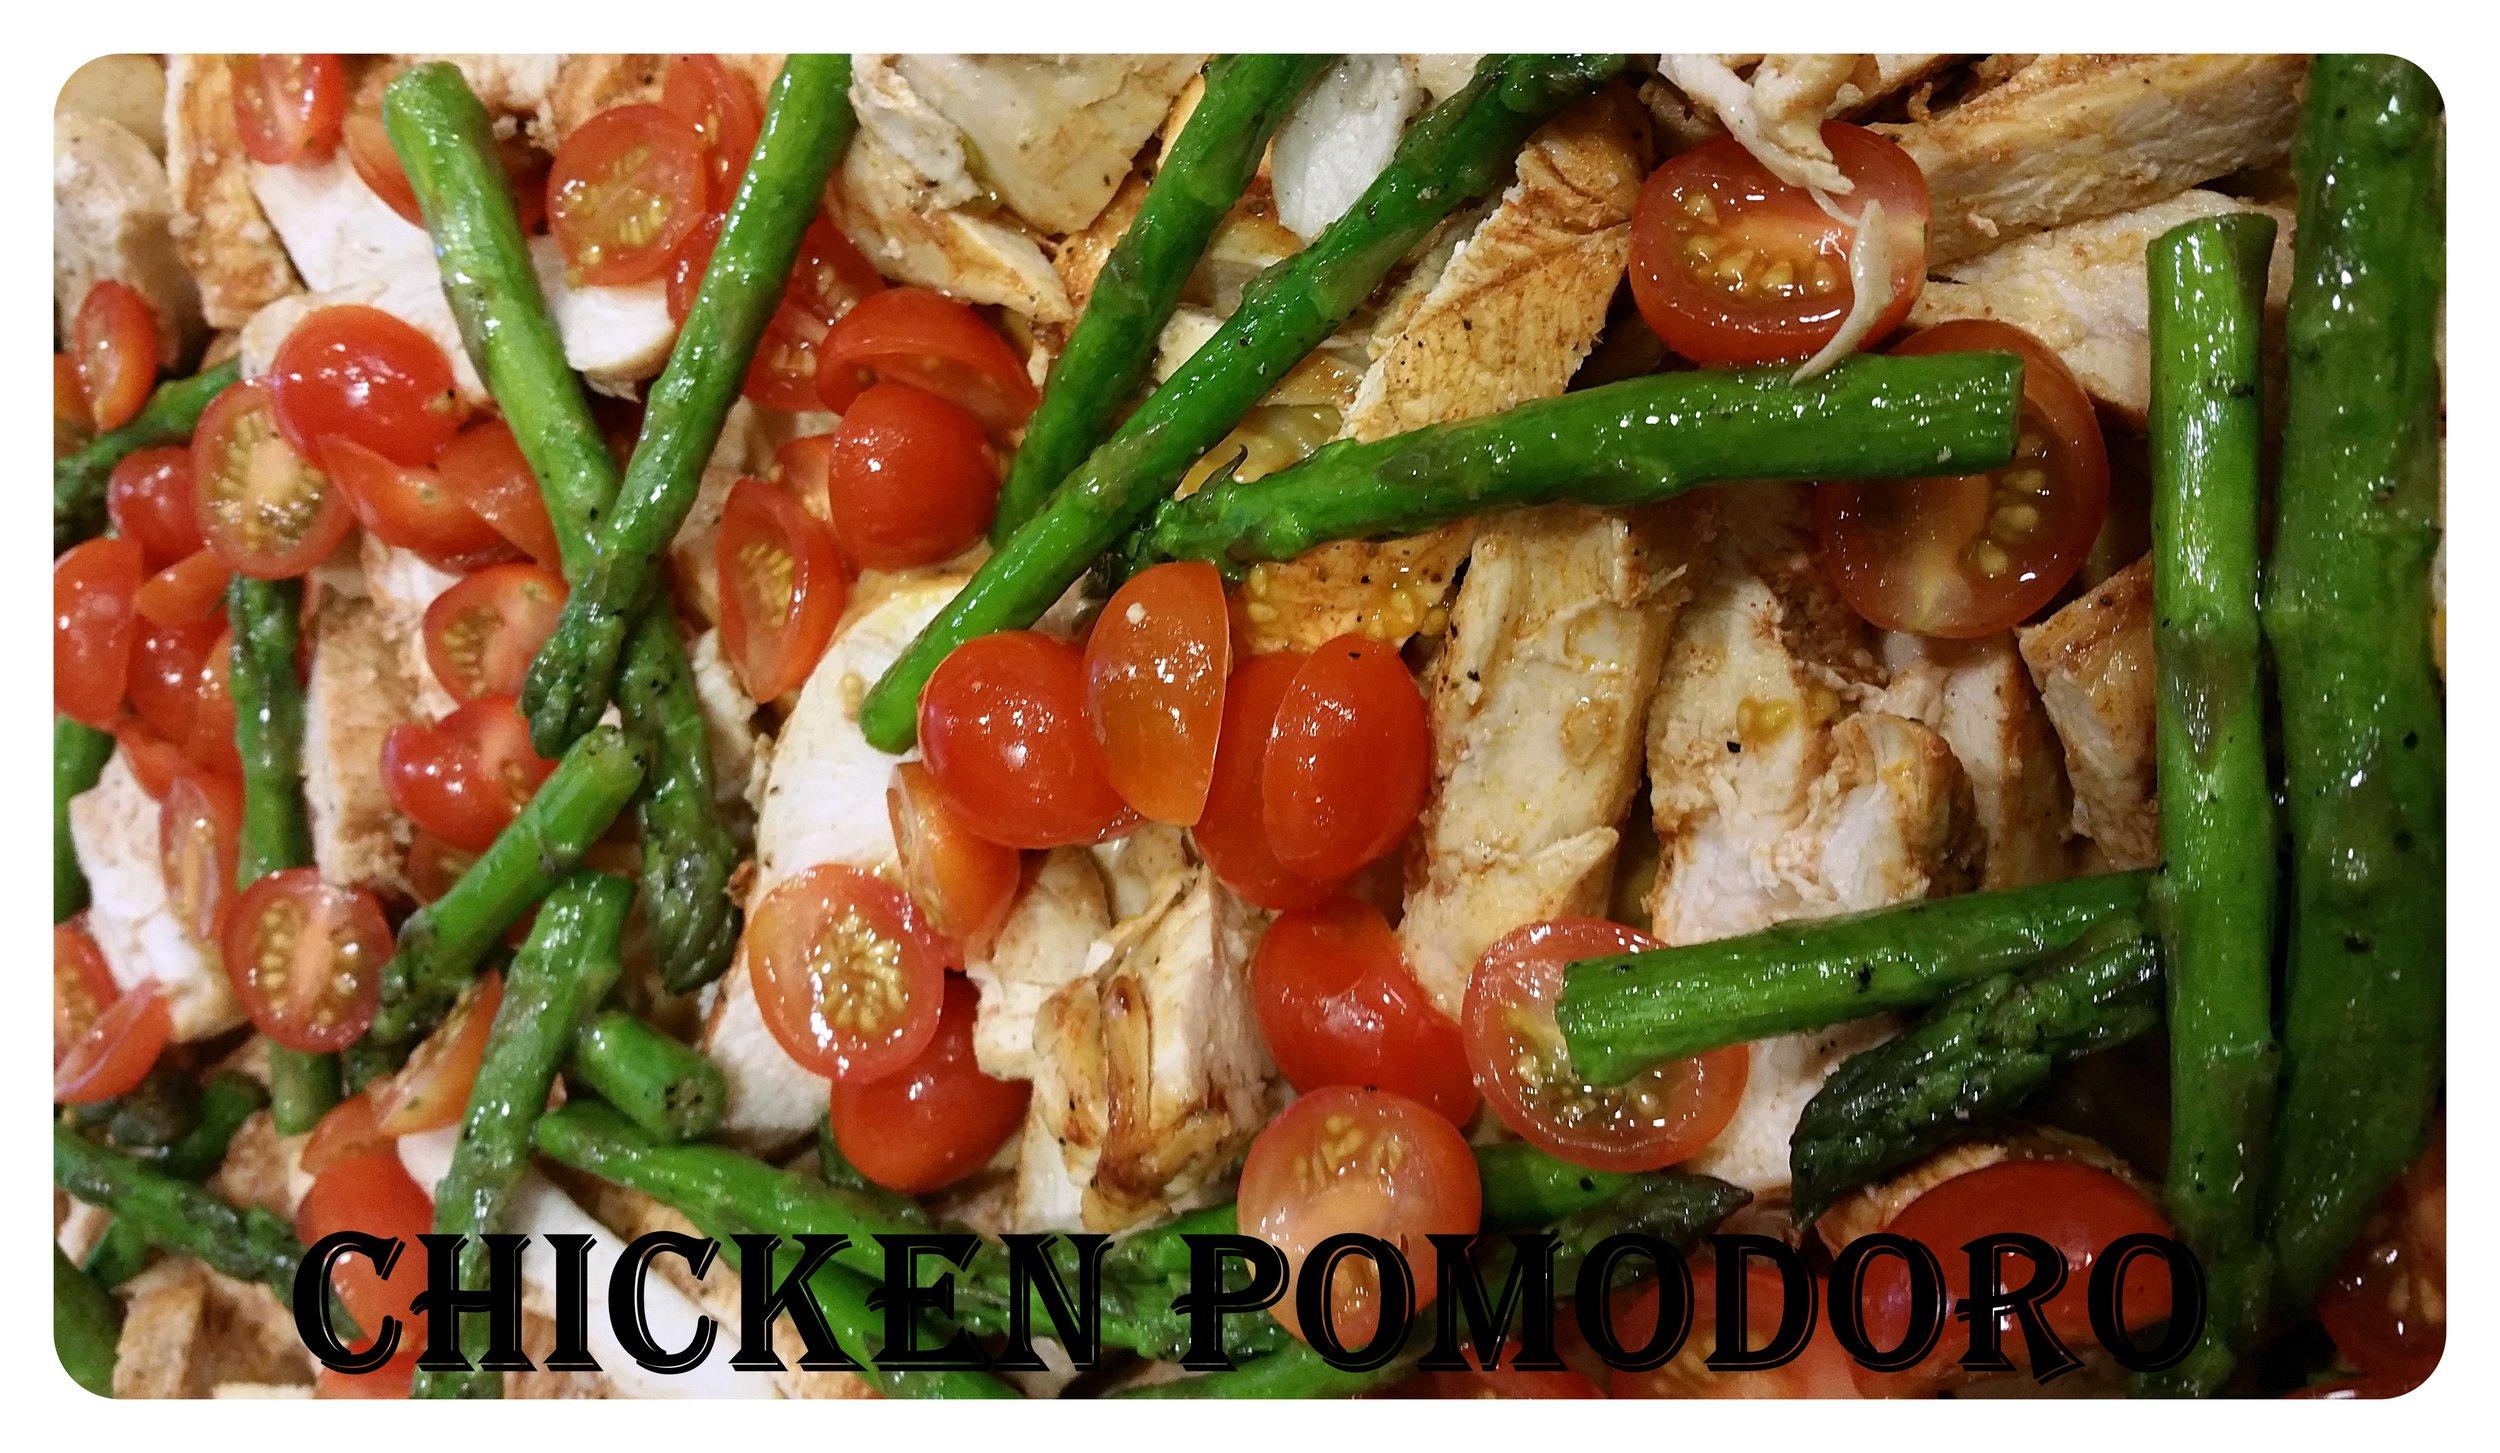 Chicken Pomodoro.jpg